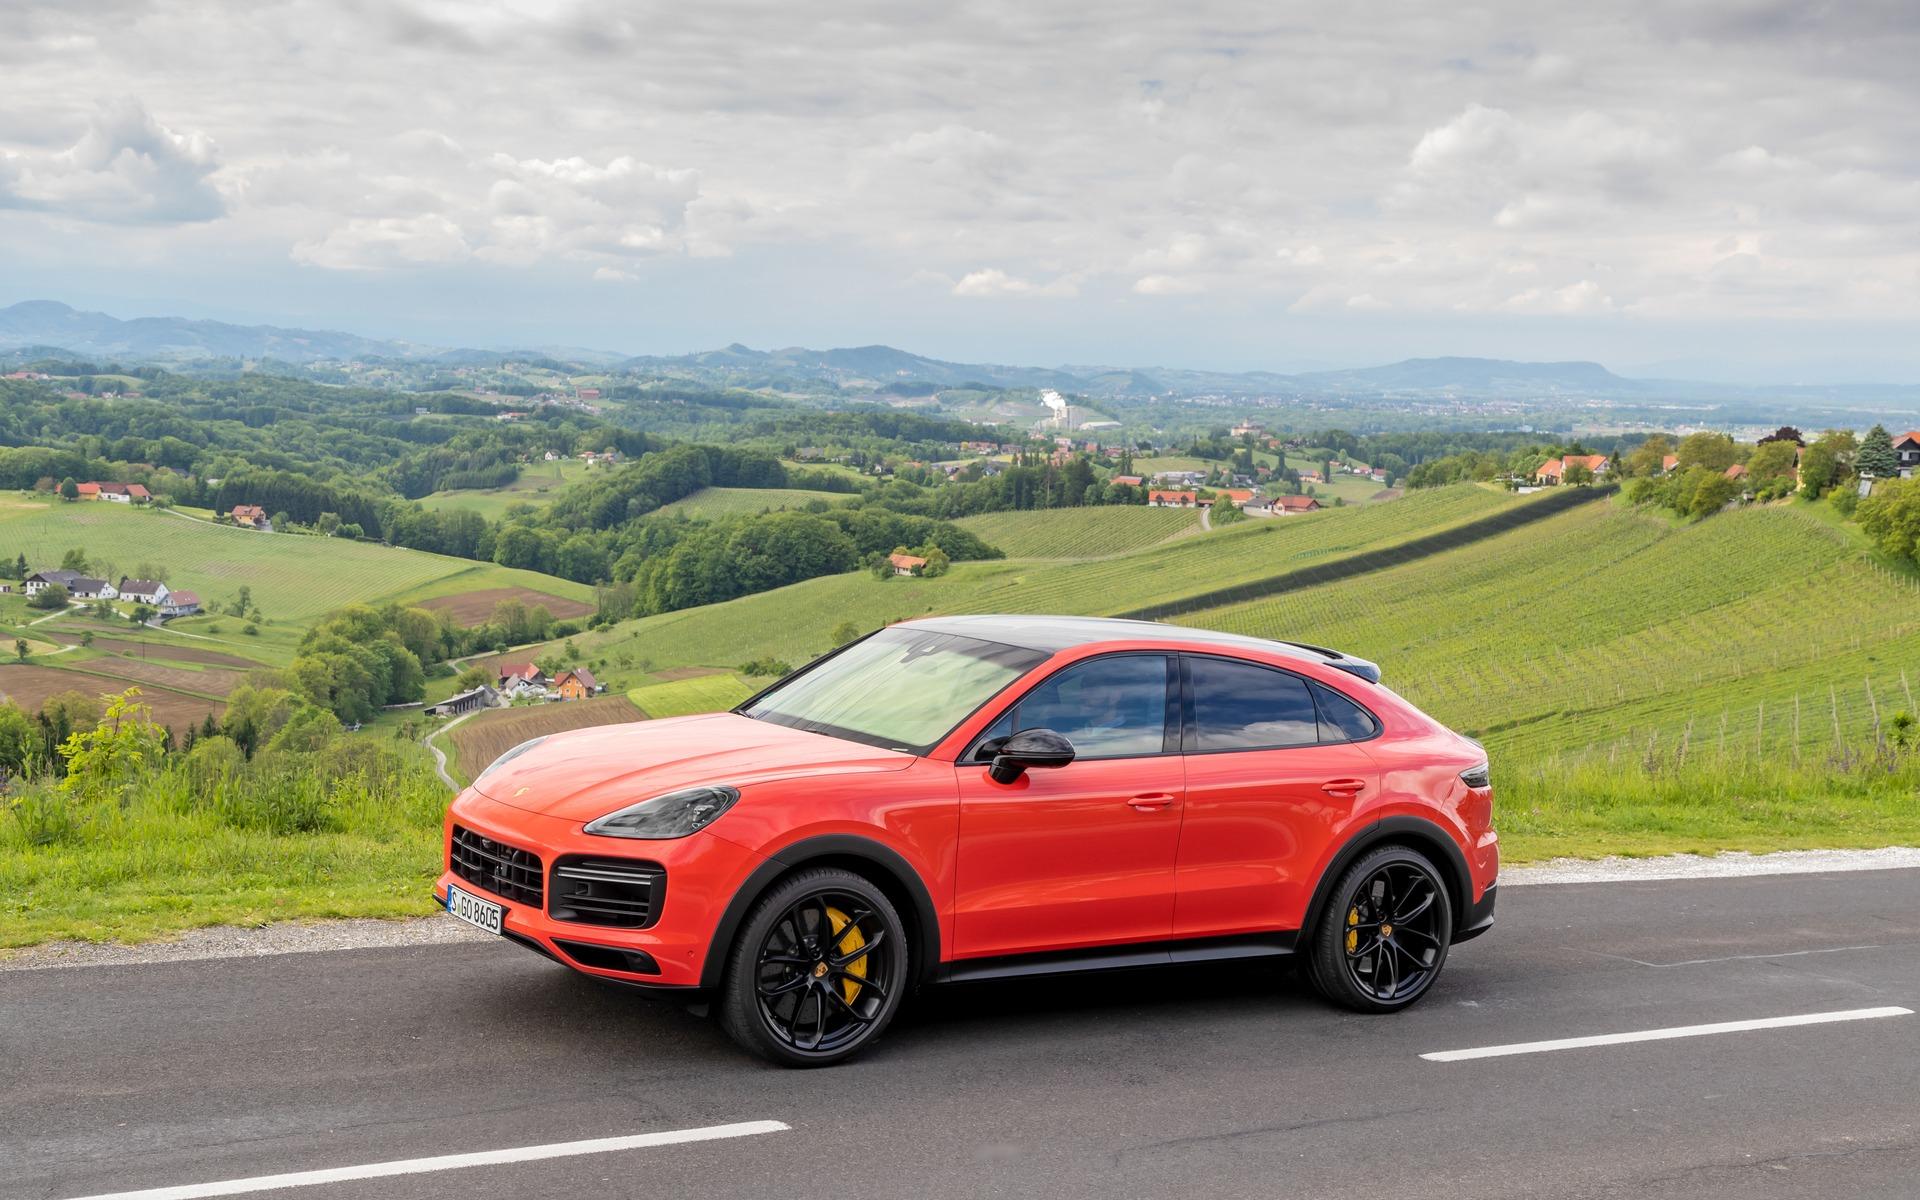 2020 Porsche Cayenne: Coupe Version, Design, Specs >> 2020 Porsche Cayenne Coupe Sportier Looks And Dynamics The Car Guide